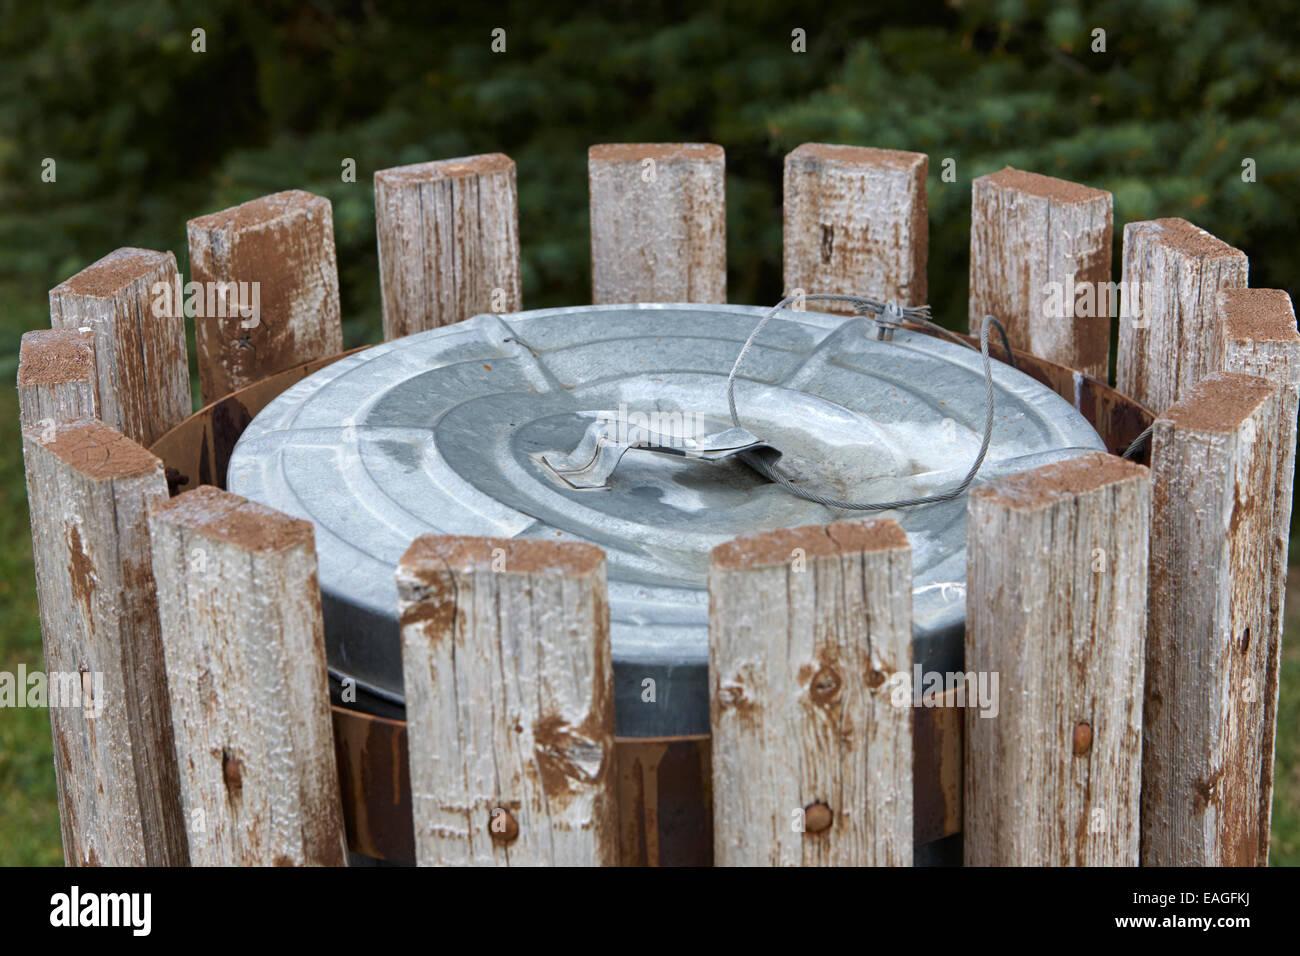 metal public garbage bin with wire lid strapSaskatchewan Canada - Stock Image